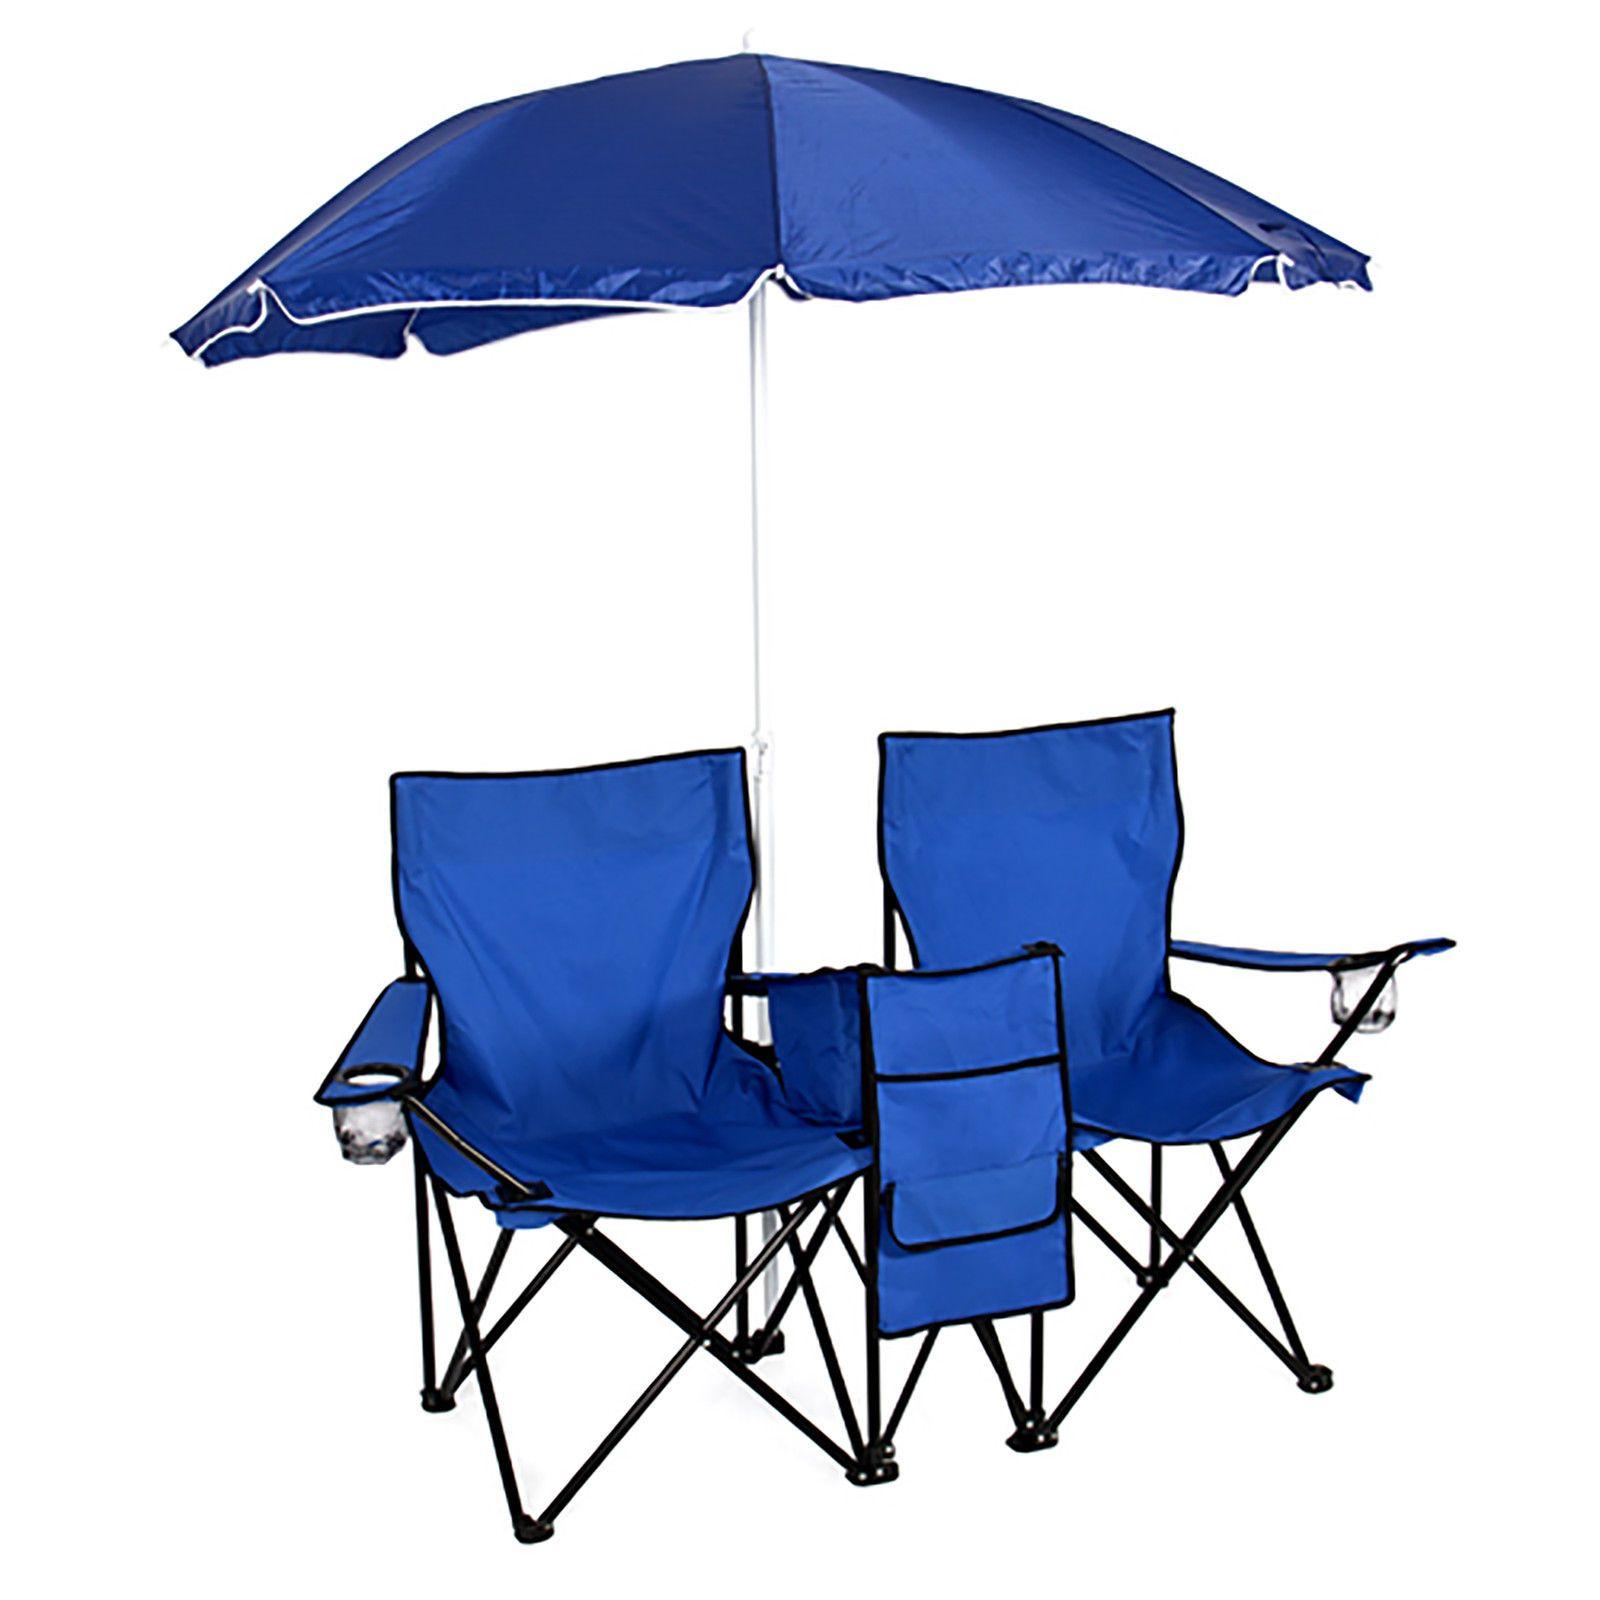 Picnic Double Folding Chair Umbrella Table Cooler Fold Up Beach